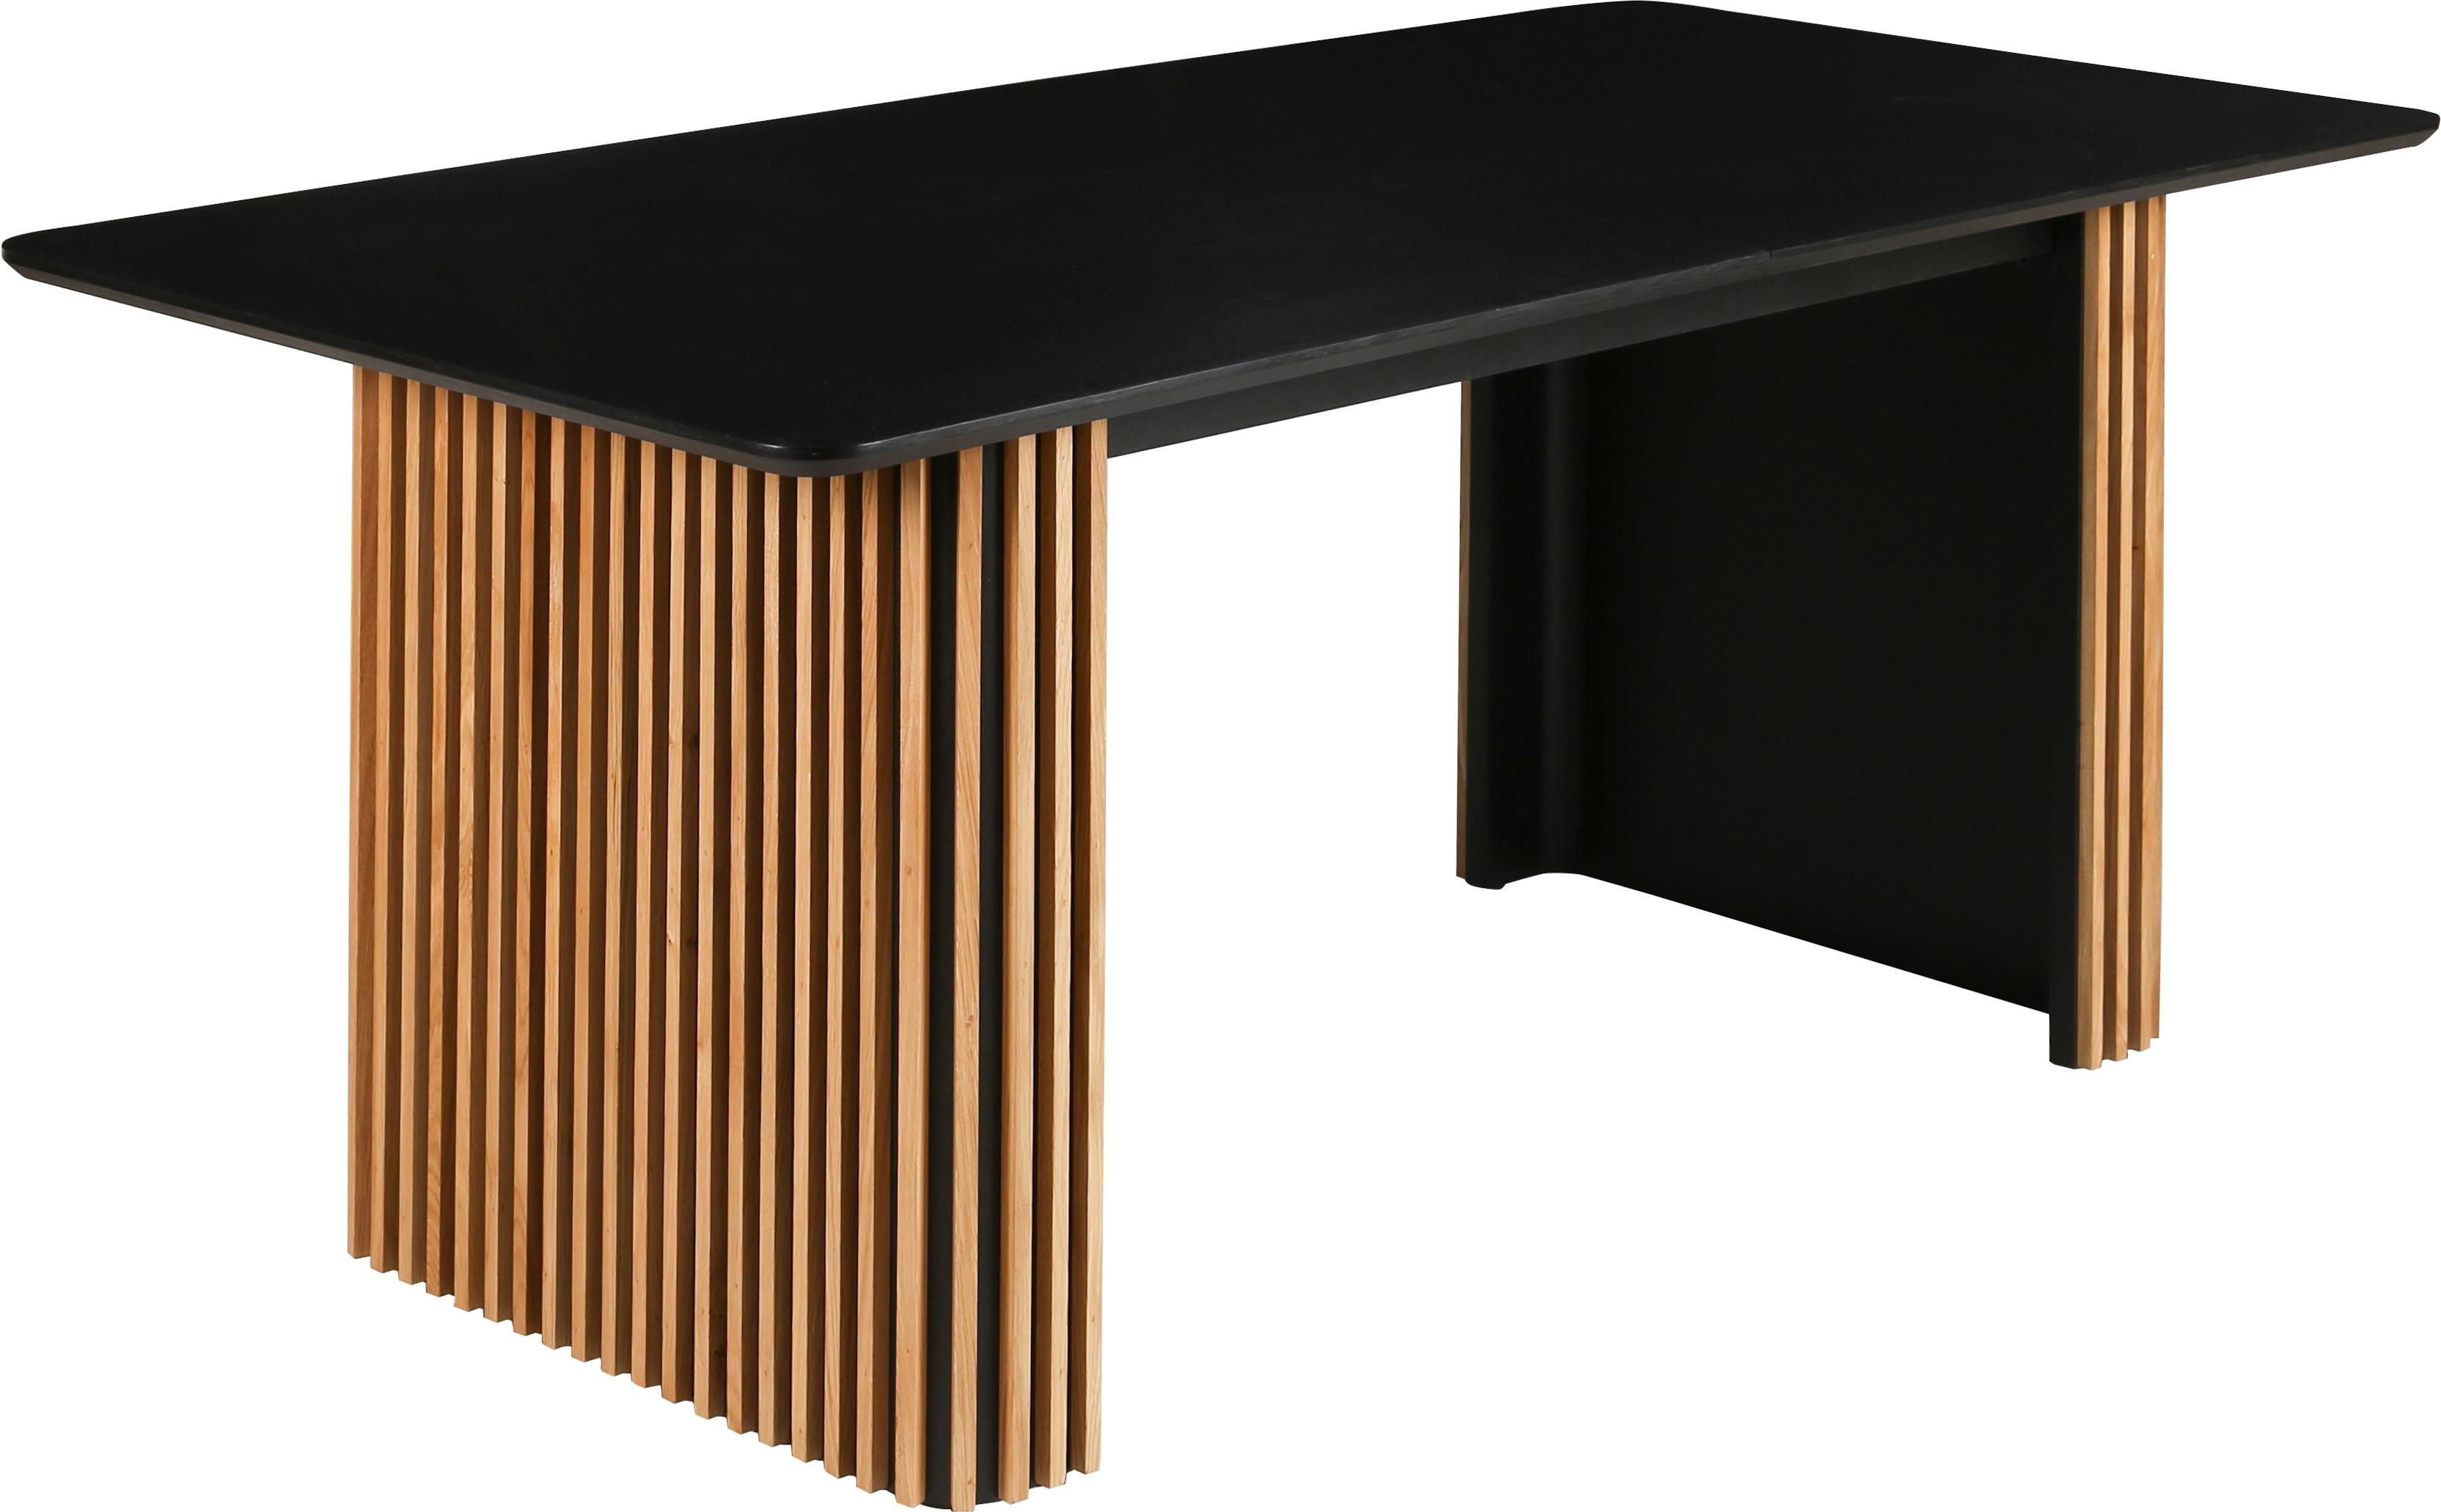 Mesa de comedor extensible Linea, Negro, roble, An 180-230 x F 75 cm